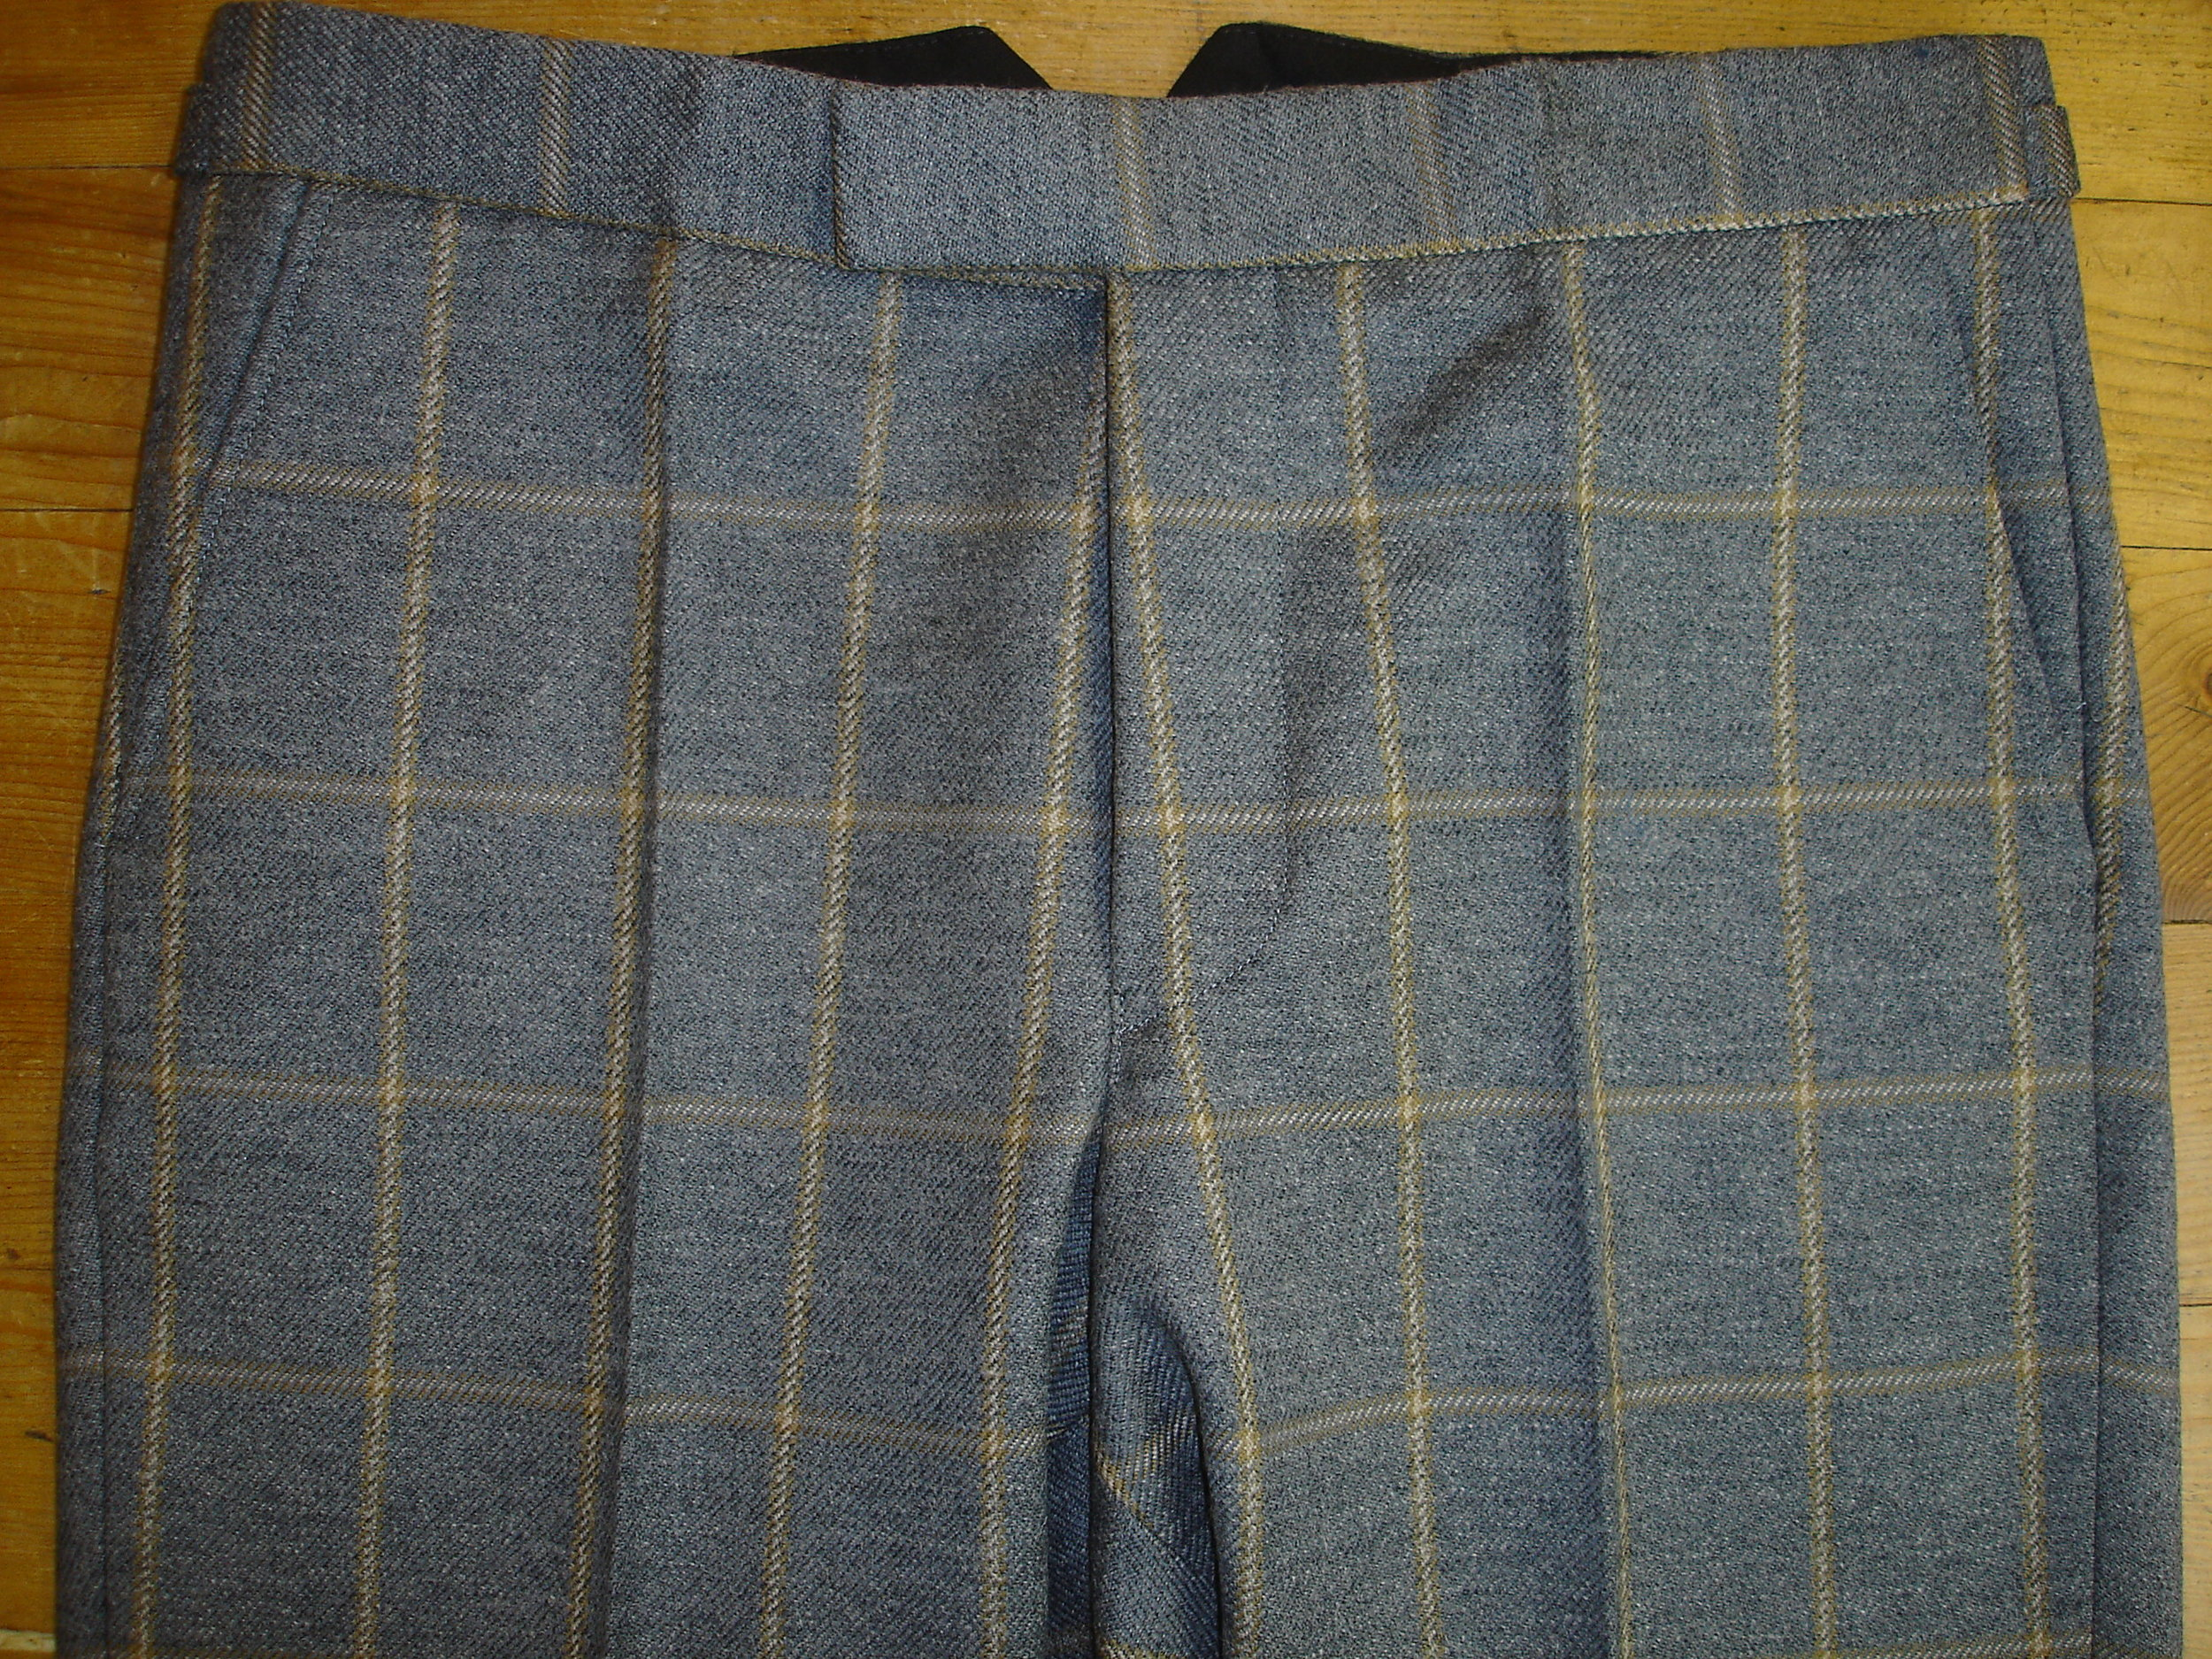 Glenhunt Grey Check 3 Piece Tweed Suit (15).JPG